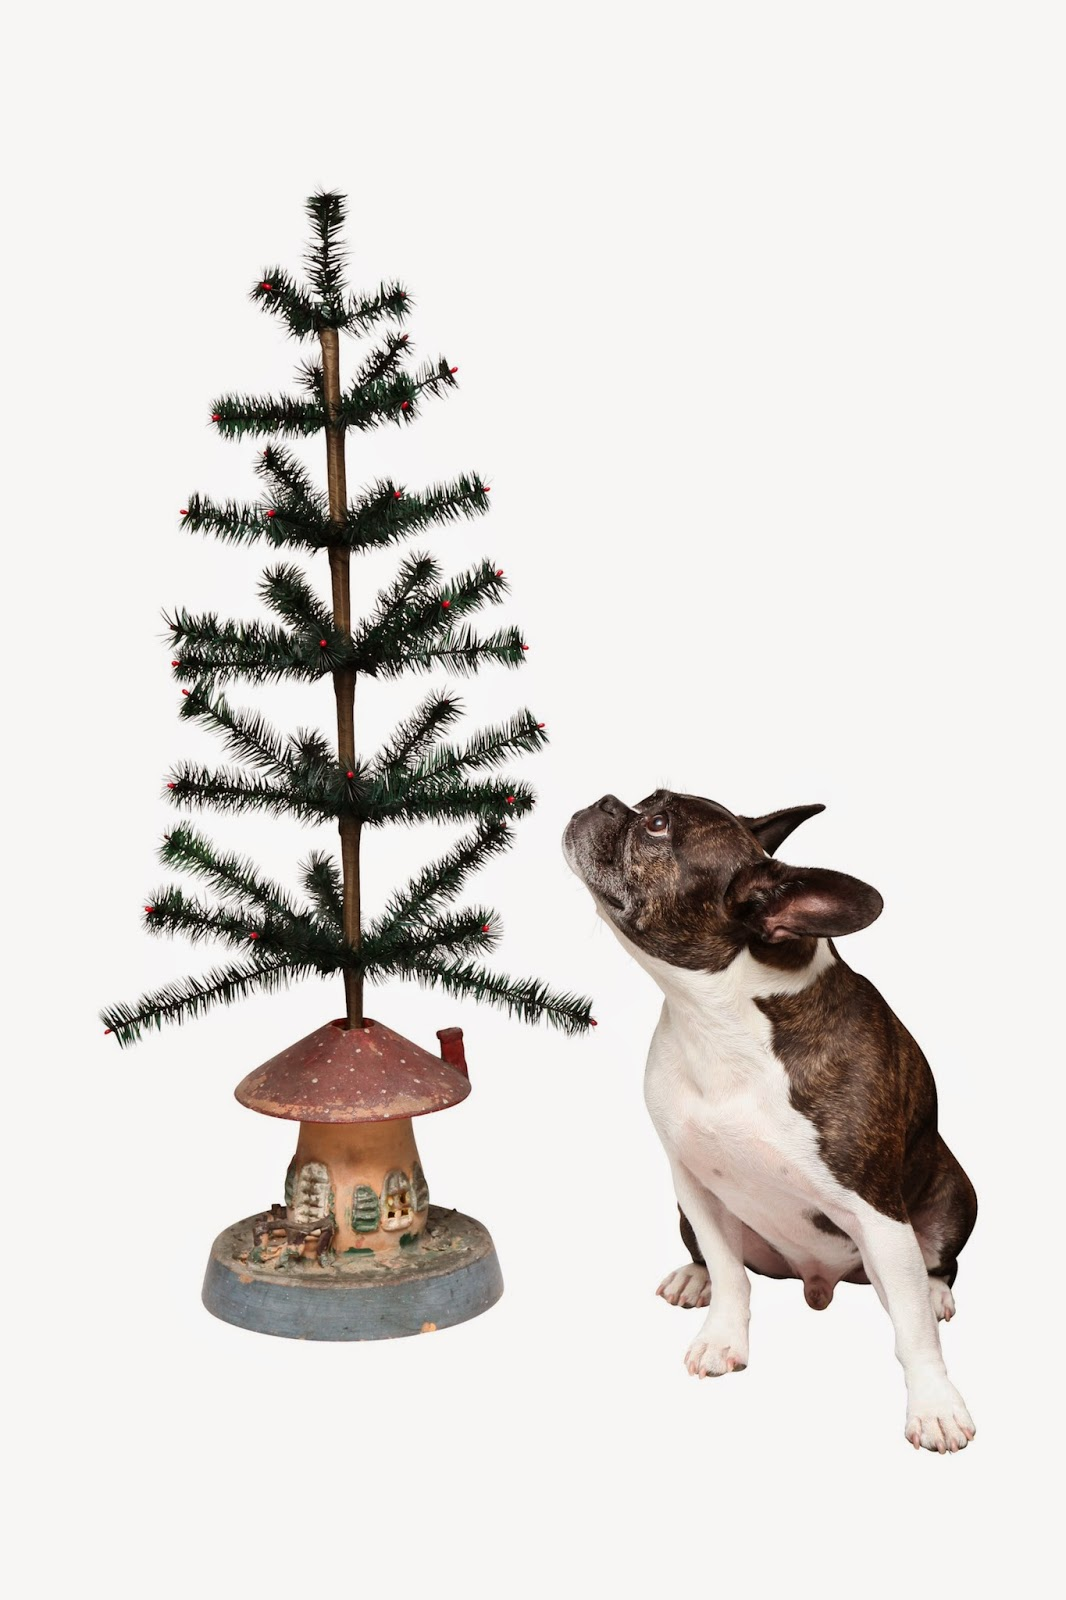 Vintage Christmas Tree Stand.Emily Evans Eerdmans Harry Heissmann On Christmas Tree